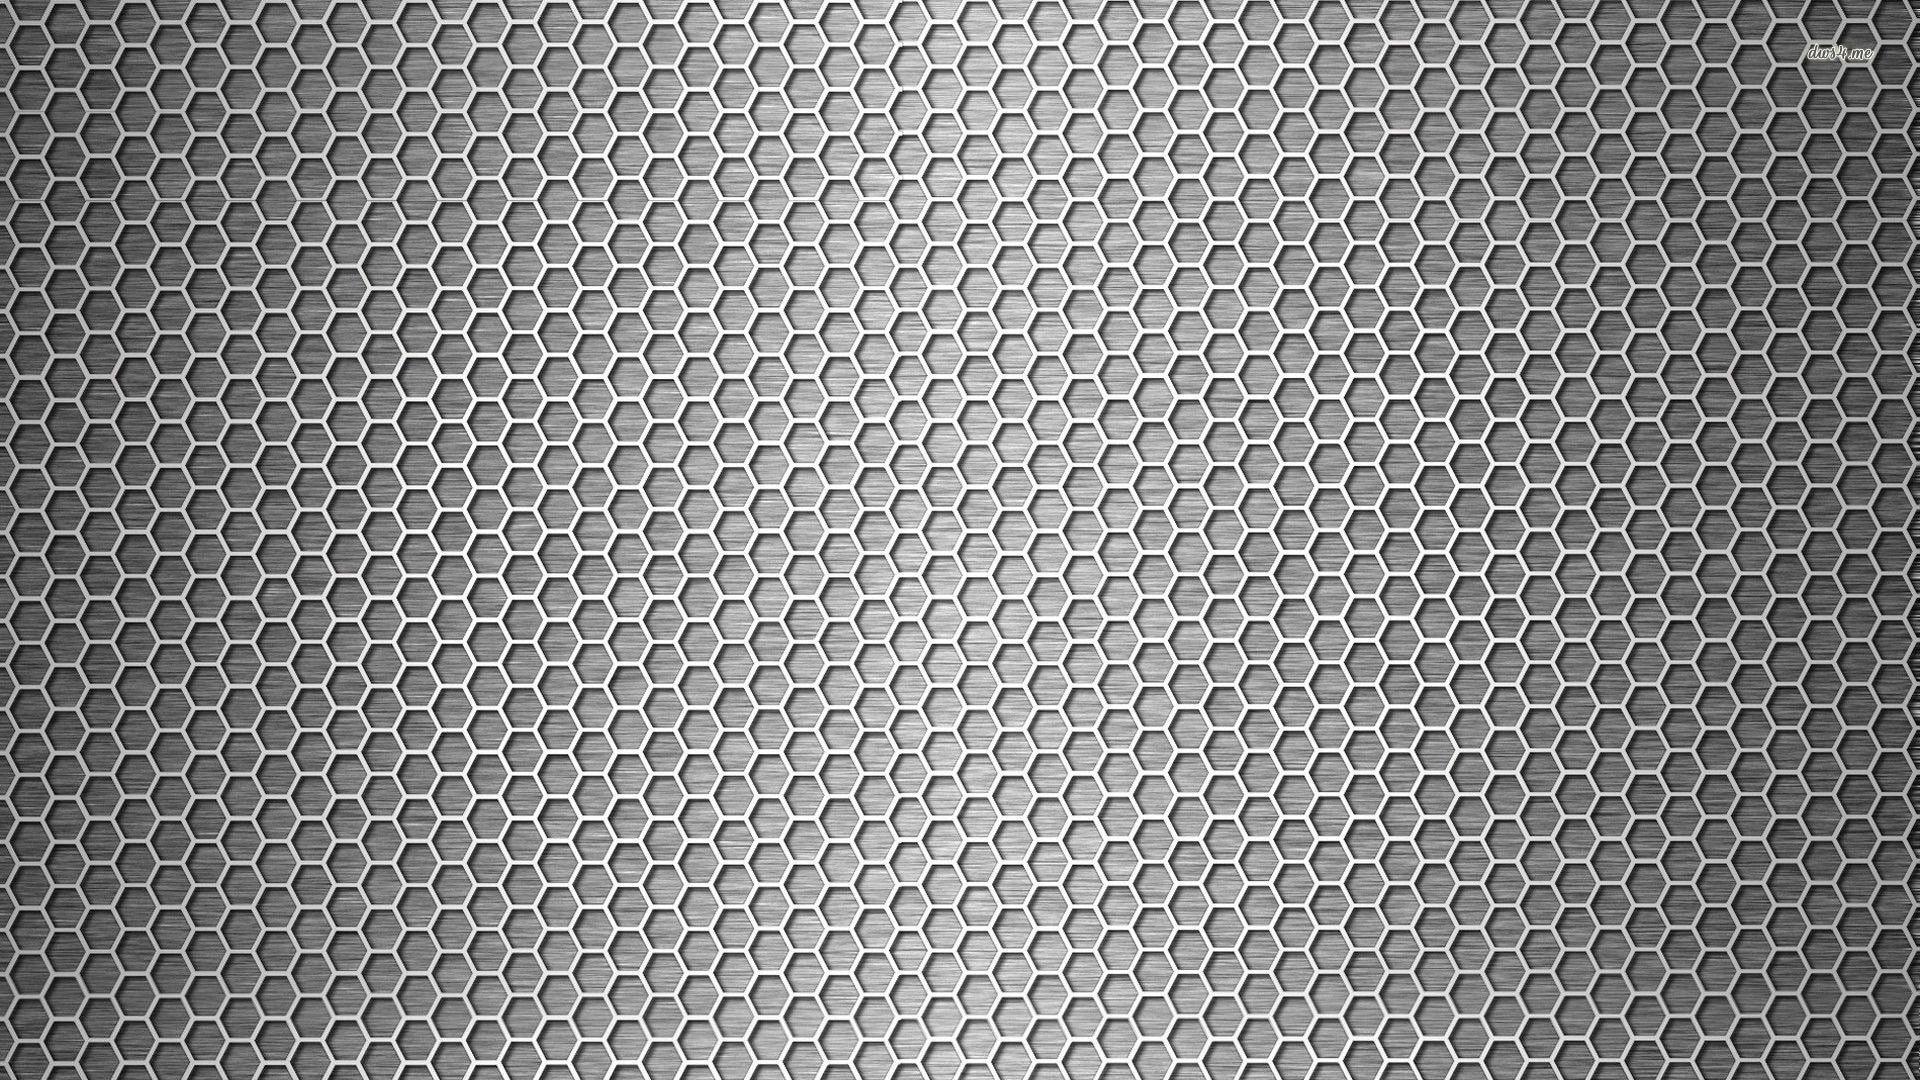 Honeycomb Pattern Template Invitation Templates Carbon Fiber Wallpaper White Carbon Fiber White Carbon Fiber Wallpaper